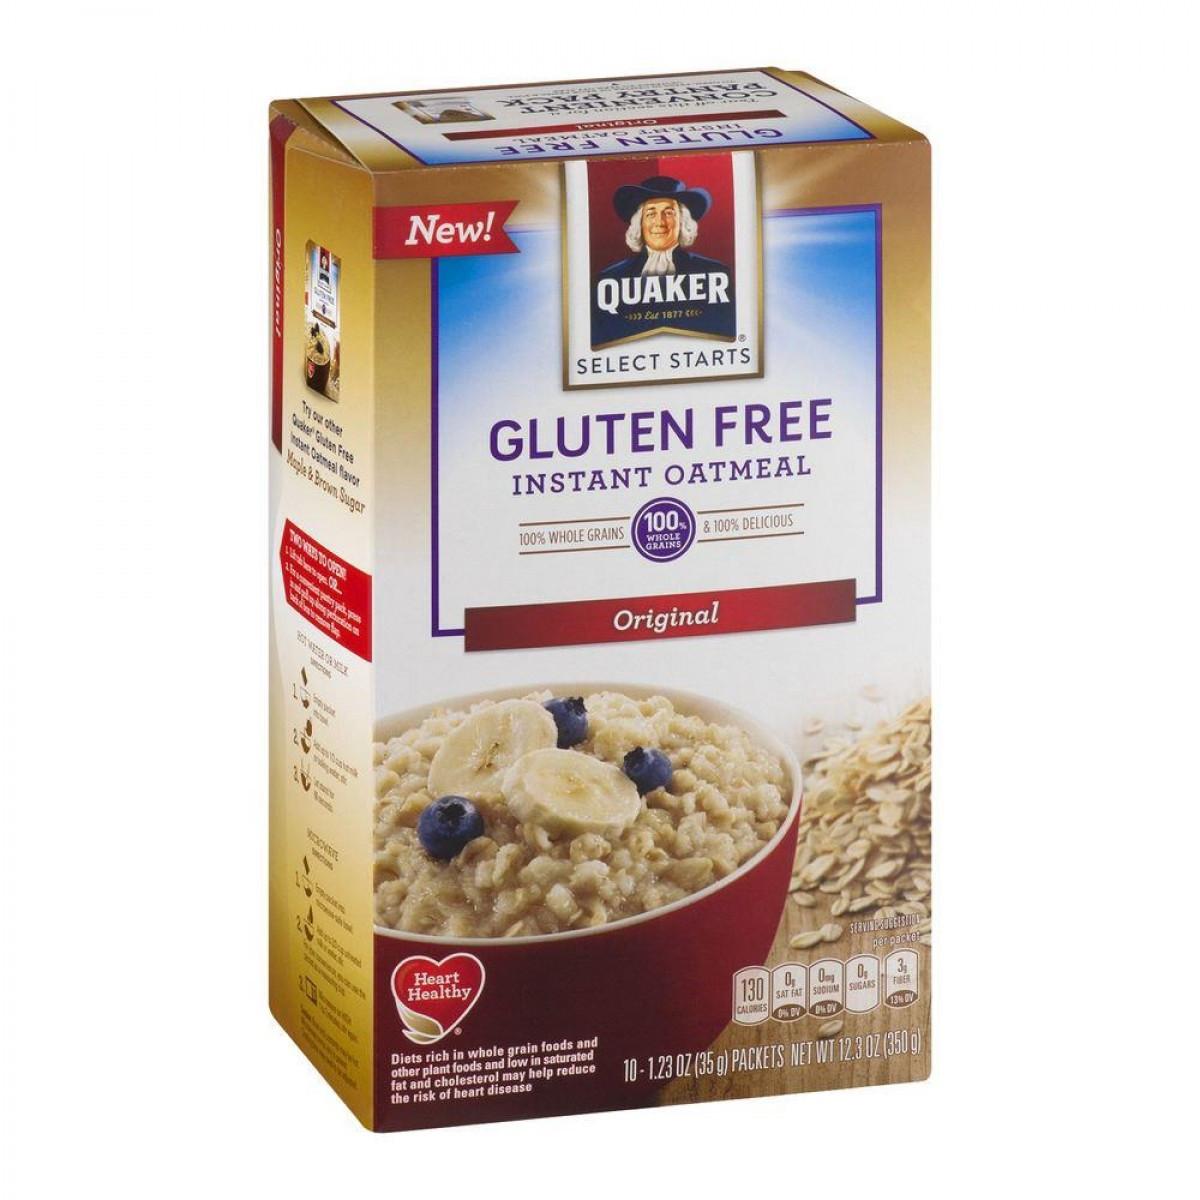 Quaker Oats Gluten Free Oatmeal  Quaker Instant Oatmeal Gluten Free Original 350g 12 3oz